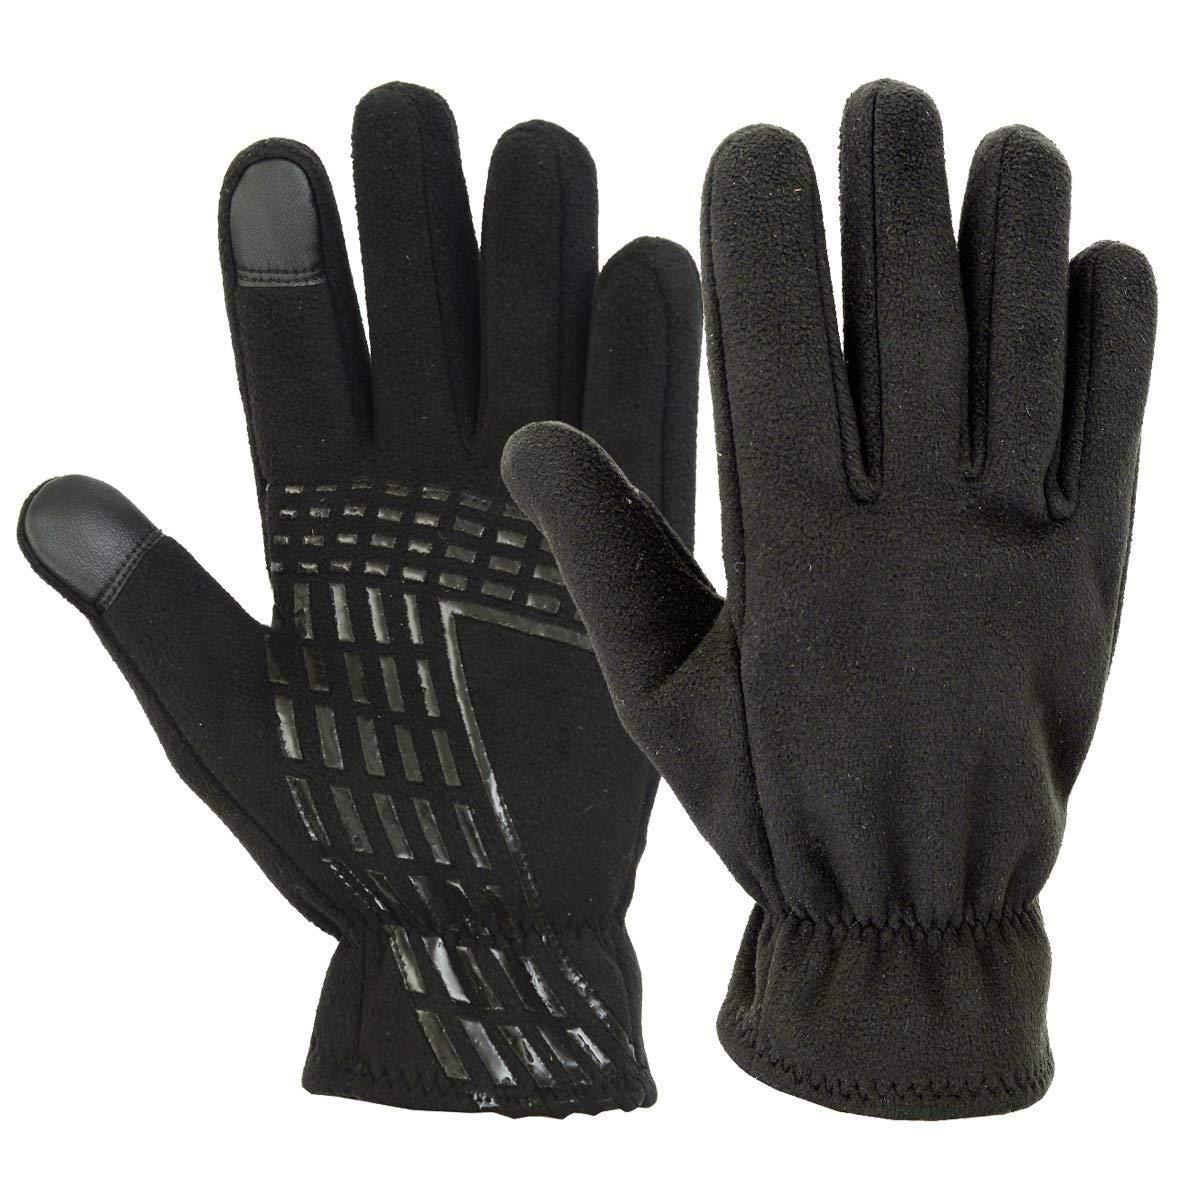 e0f105262 Get Quotations · SPG Men WINTER GLOVES Thick Fleece Warm Windproof Snow Ski  Motorbike Glove Black